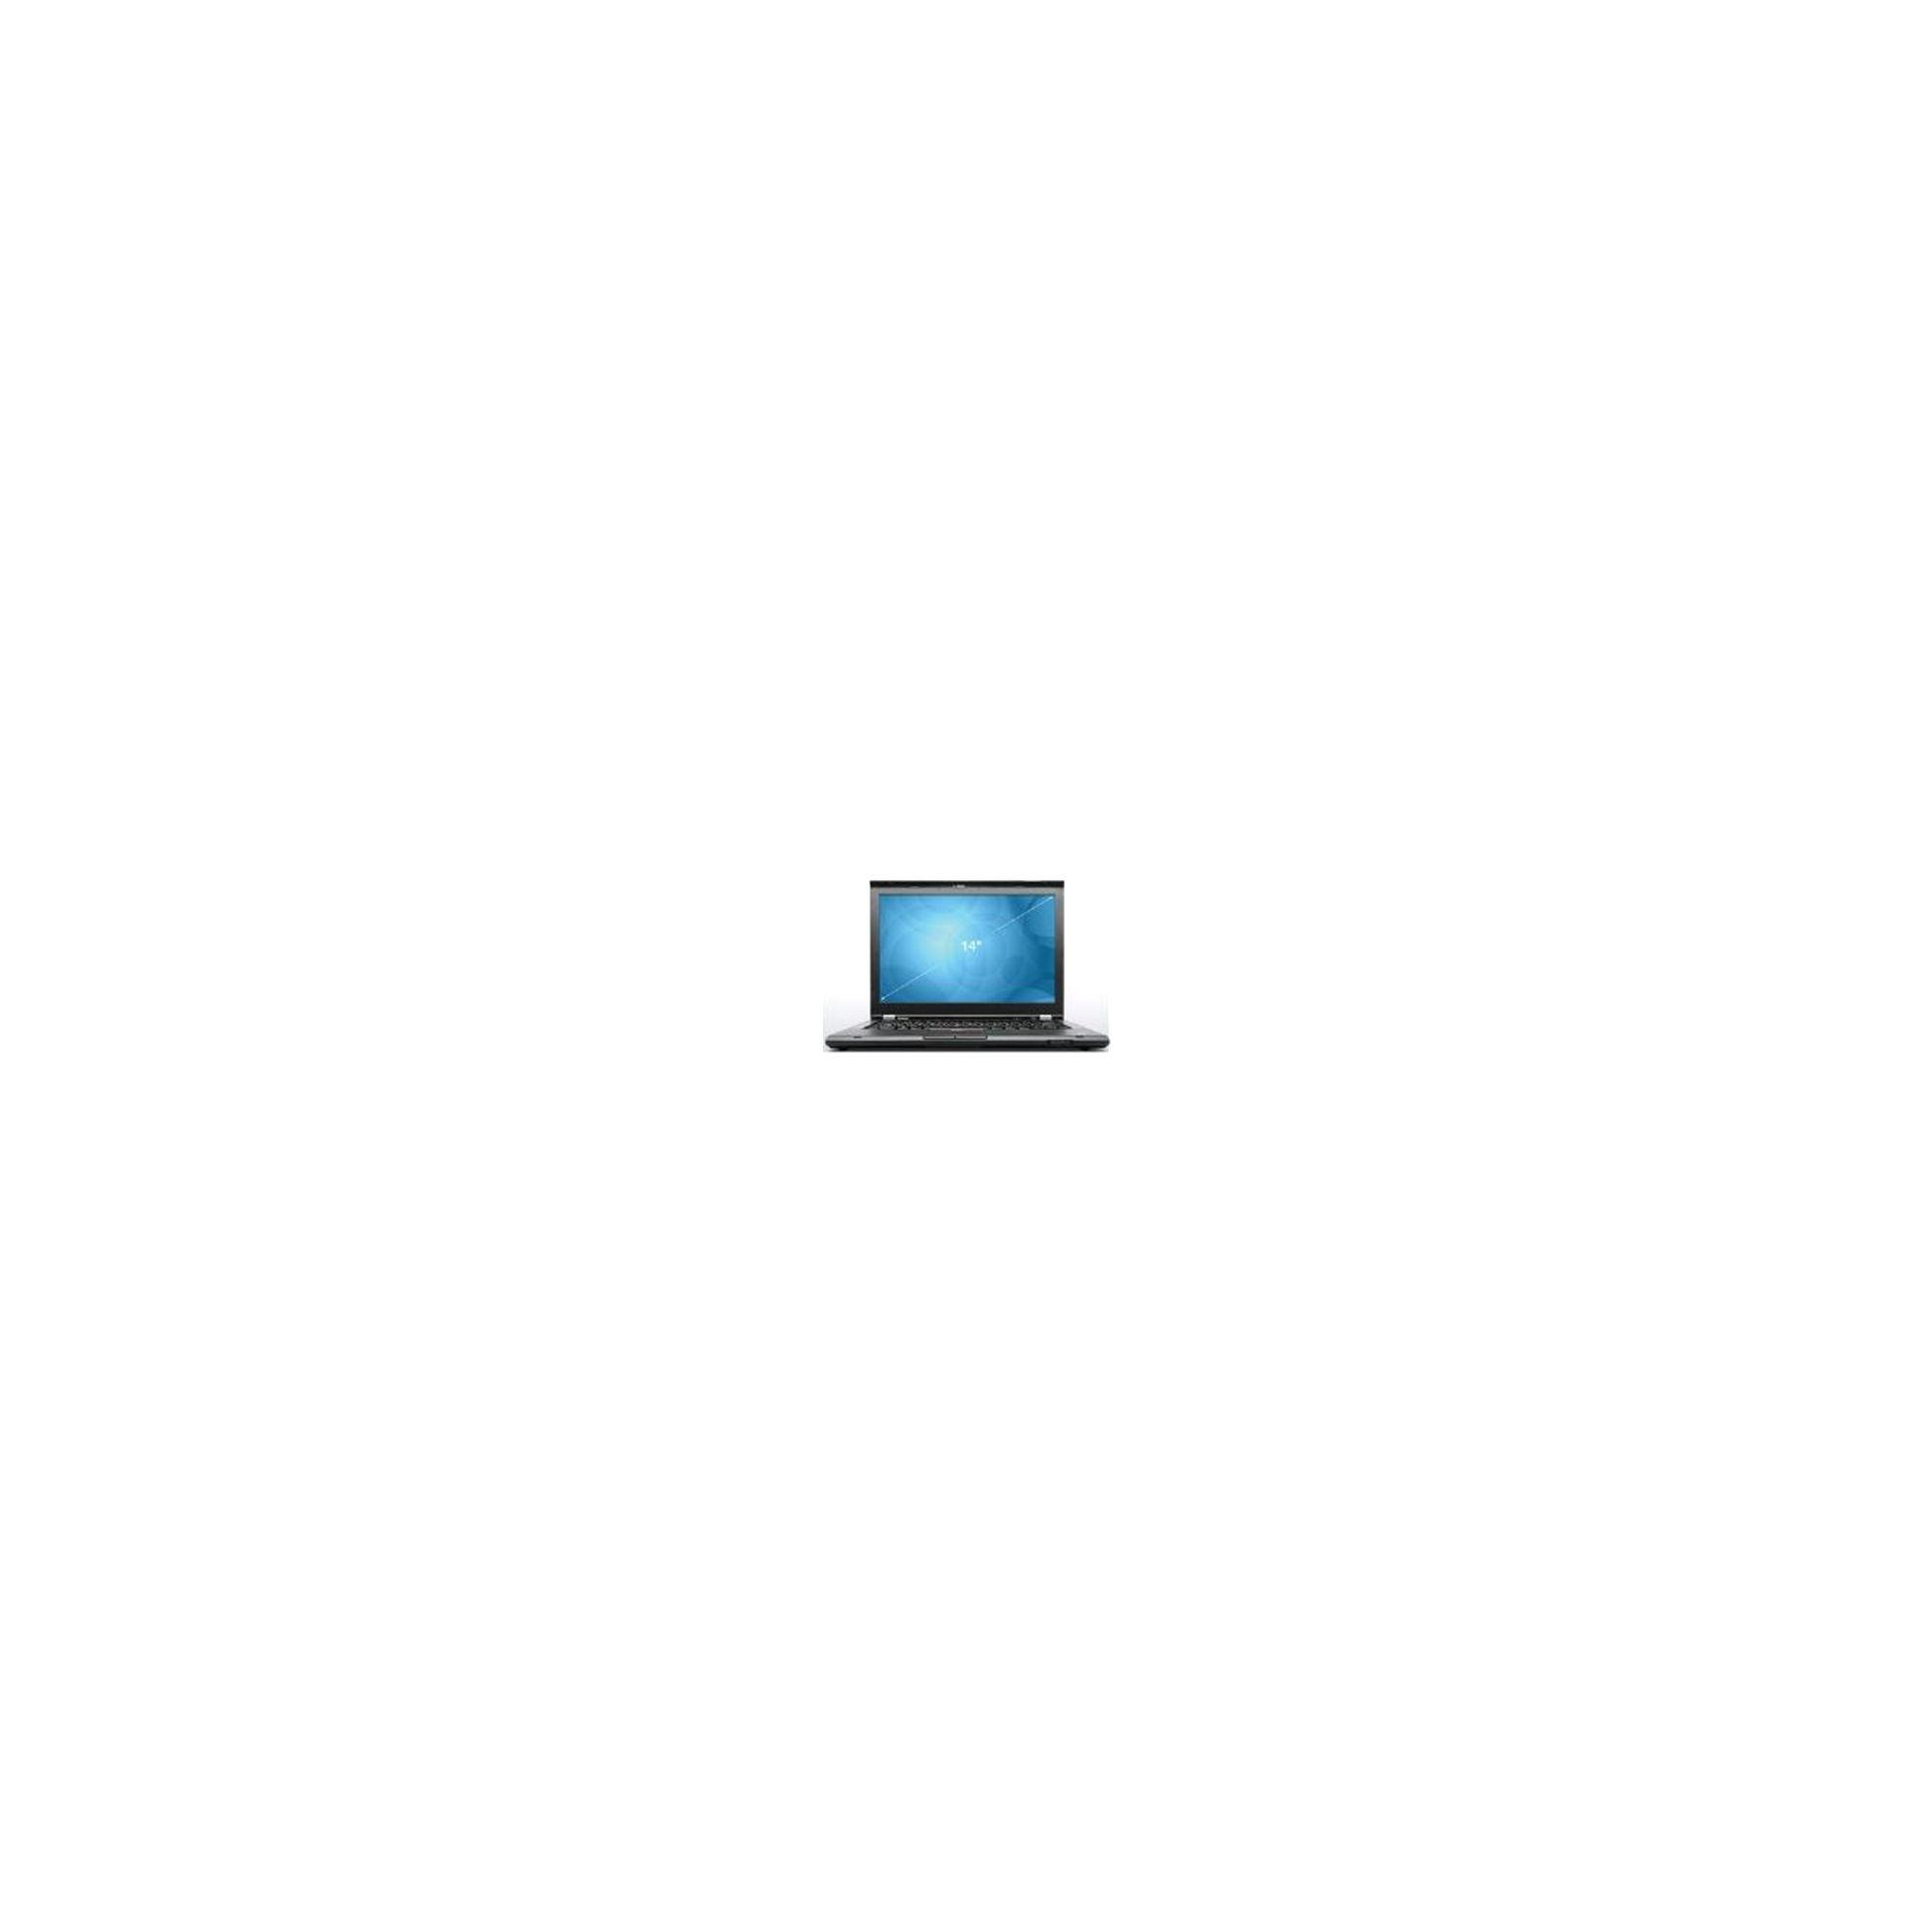 Lenovo ThinkPad T430 2349KDG (14.0 inch) Notebook Core i5 (3210M) 2.5GHz 4GB 500GB DVD±RW WLAN BT Webcam Windows 7 Pro 64-bit/Windows 8 Pro 64-bit at Tesco Direct